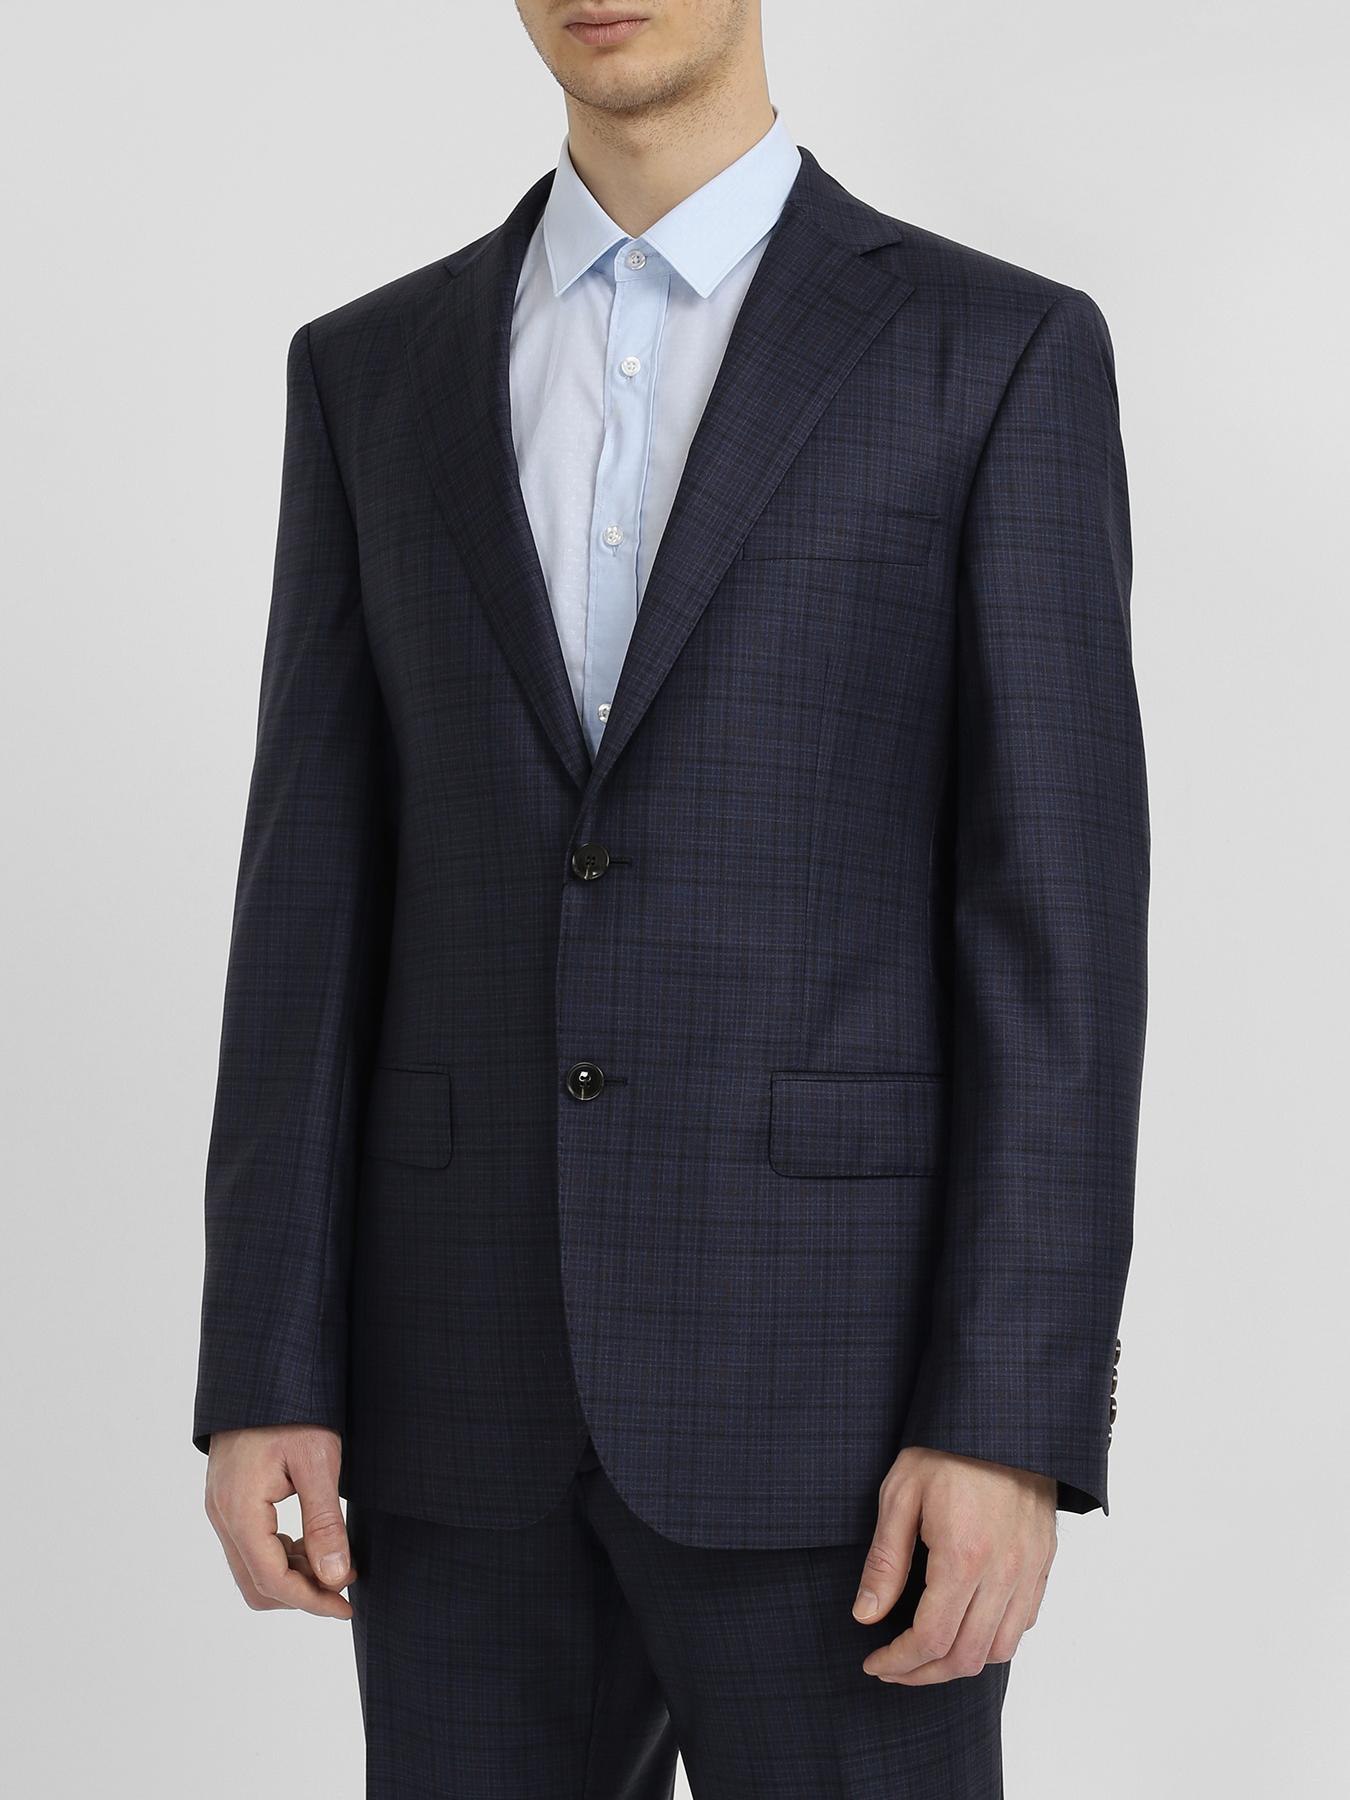 Alessandro Manzoni Классический костюм из шерсти фото